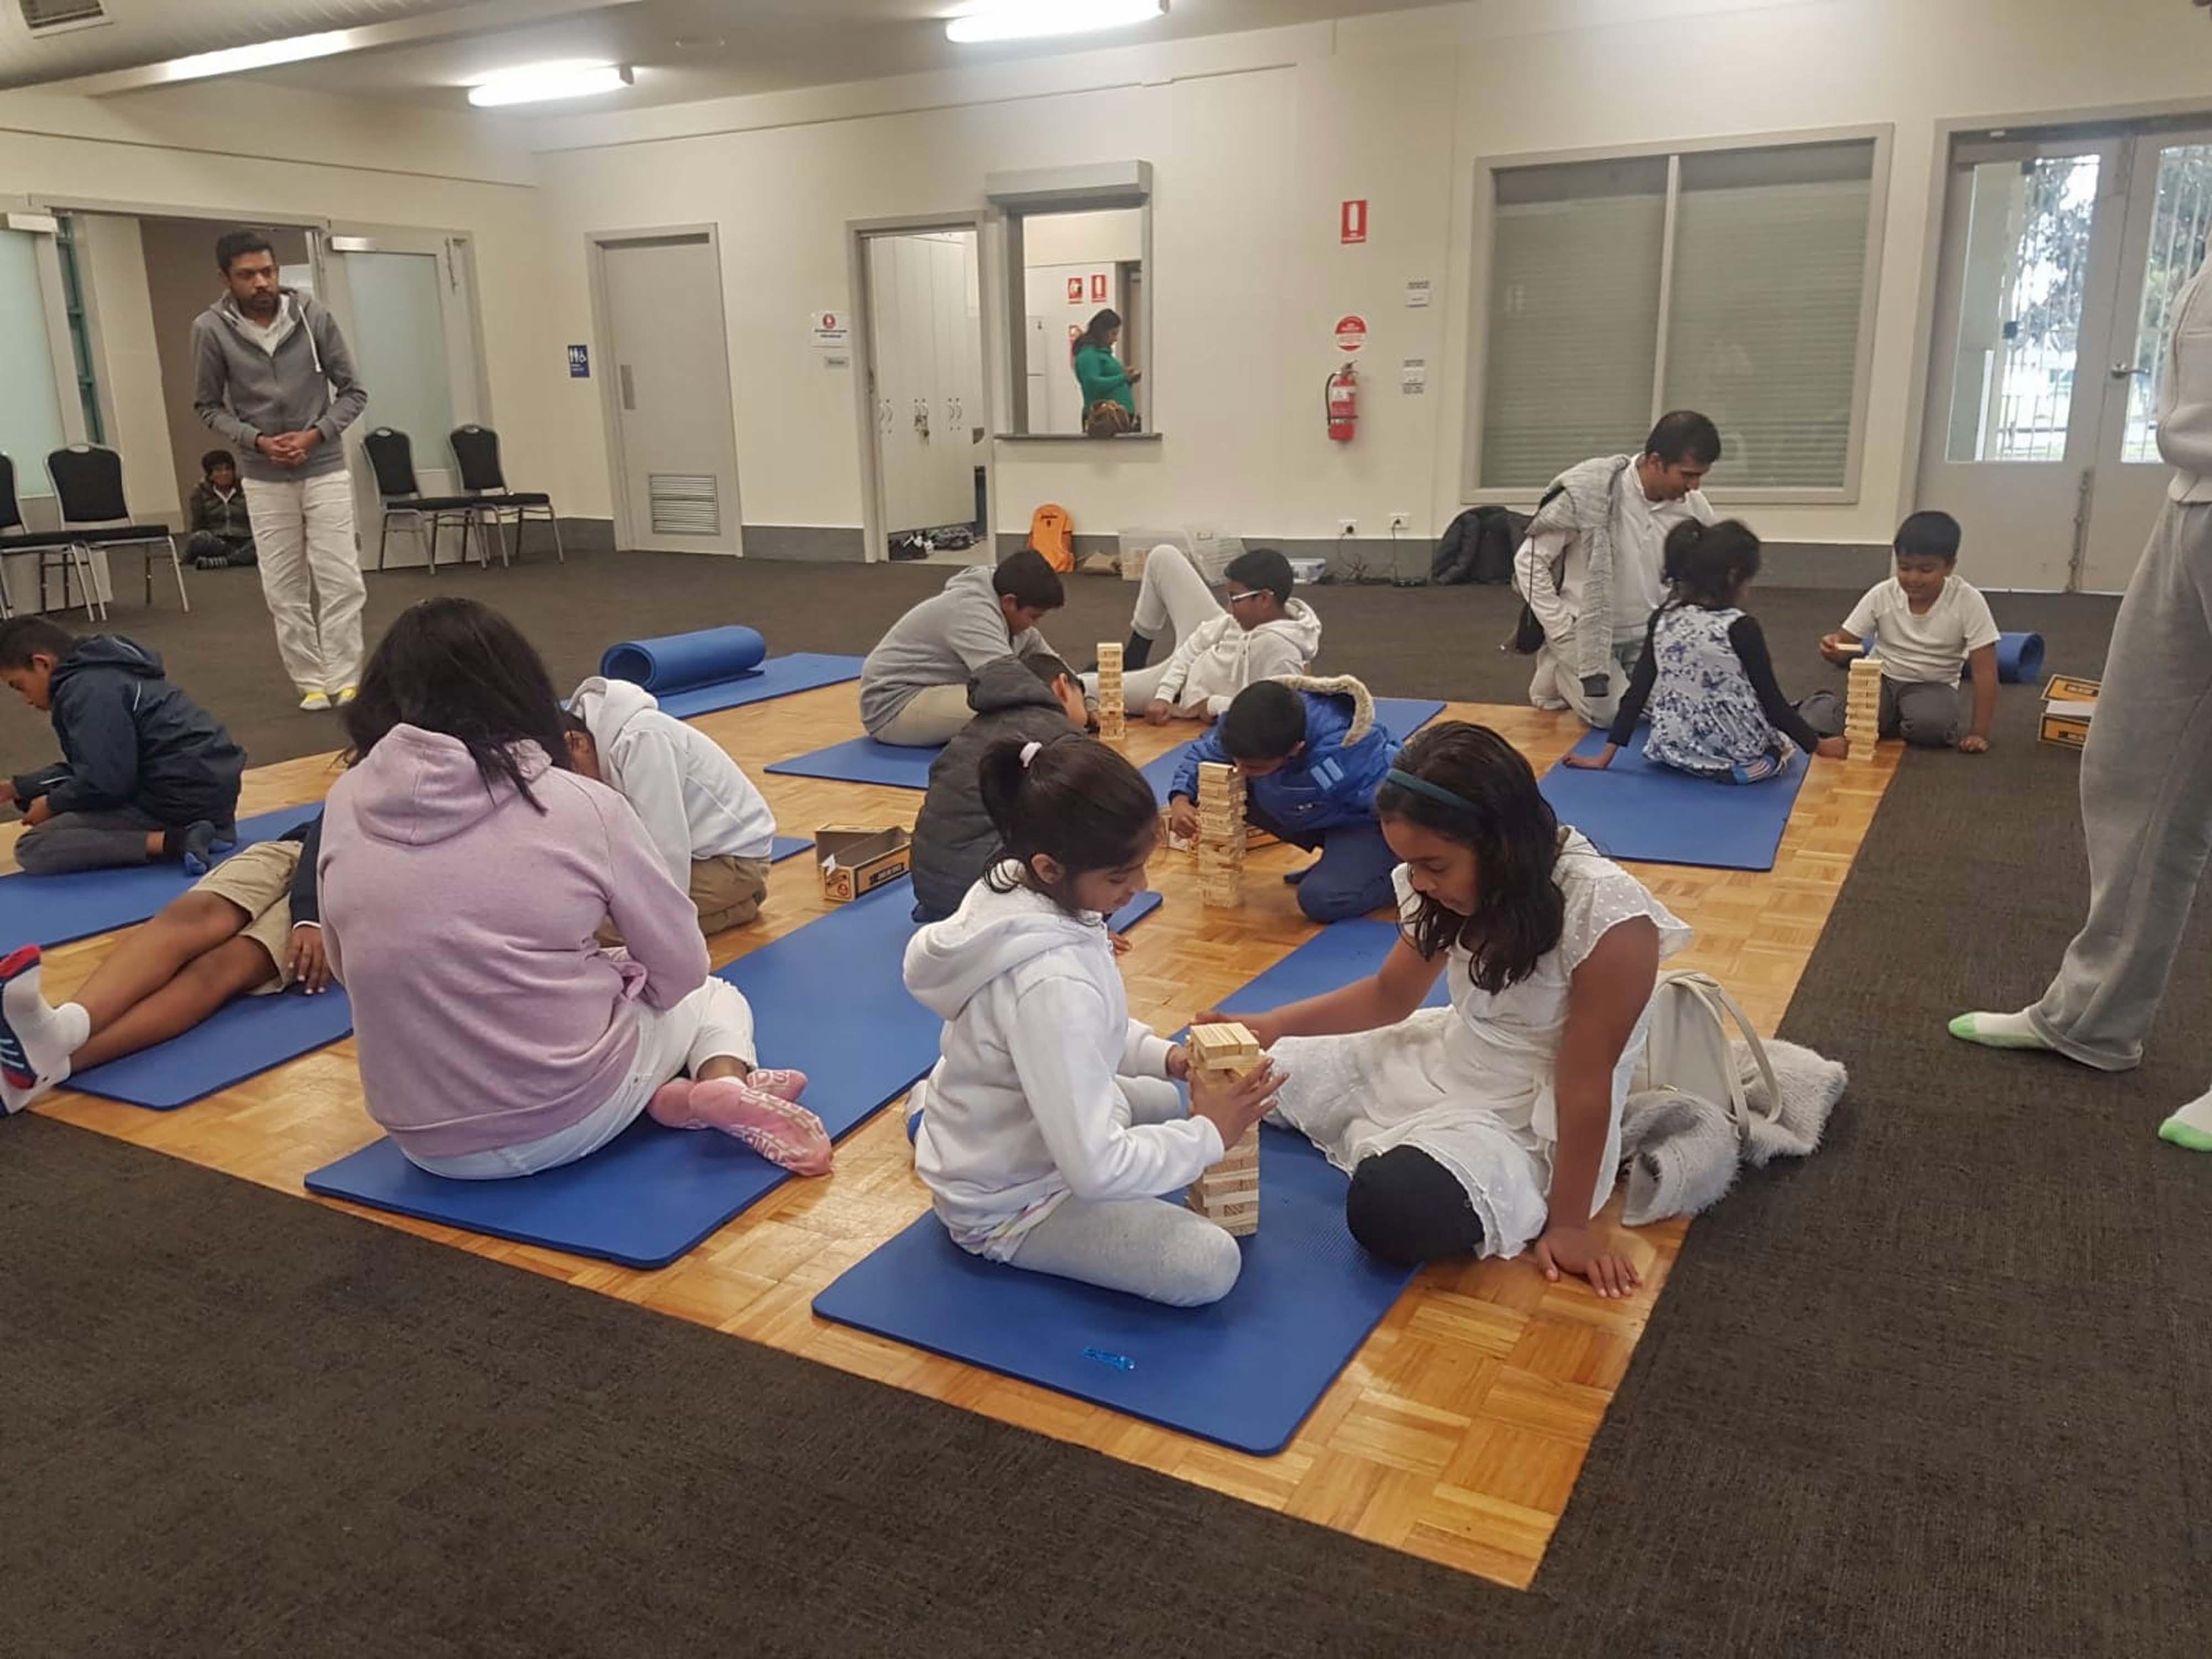 Sati Pasala Bundoora, Australia – September 2019